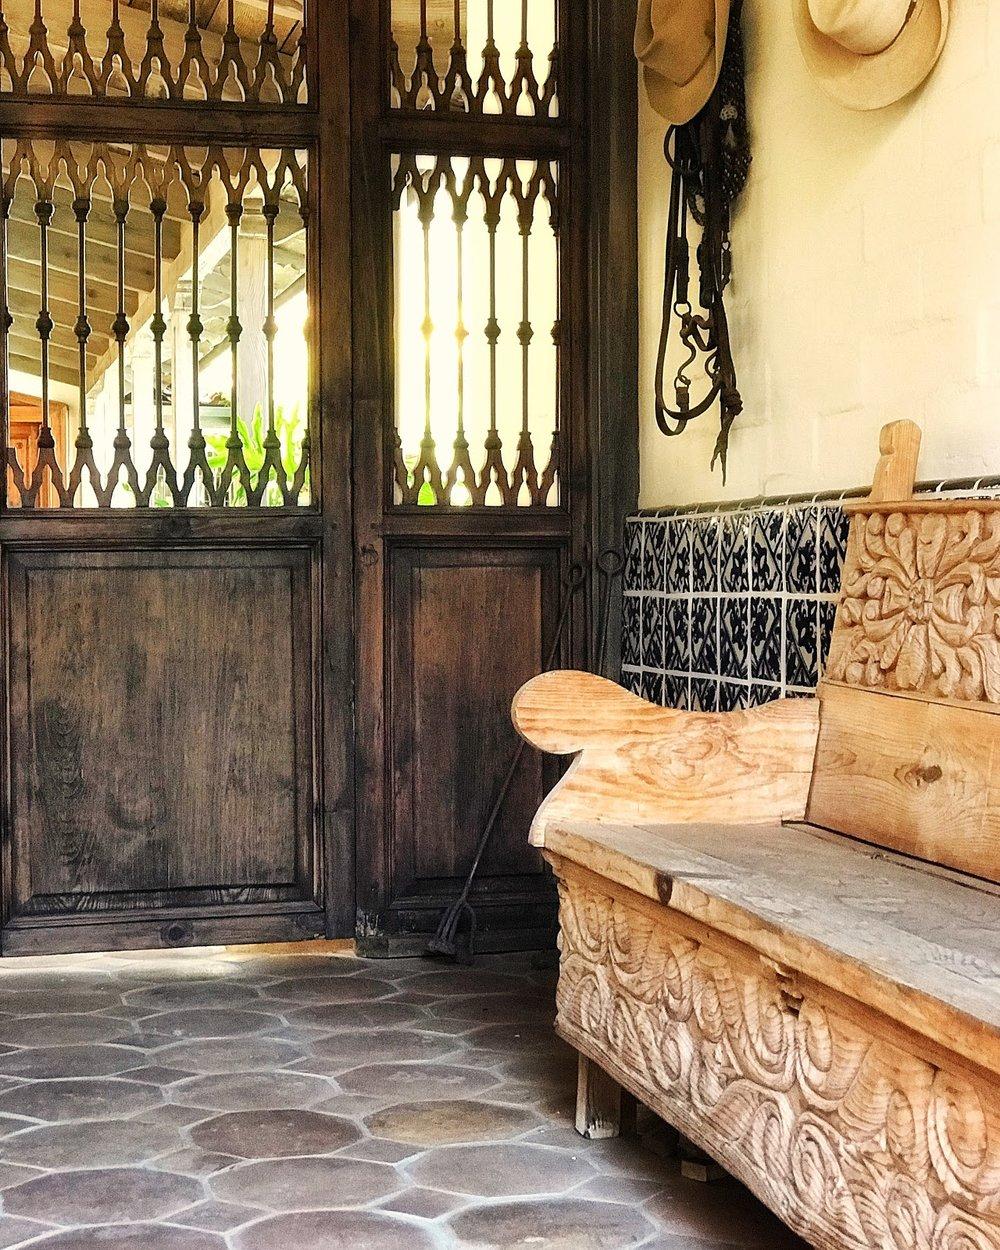 Pierced walnut entry doors that lead to the hacienda's inner courtyard